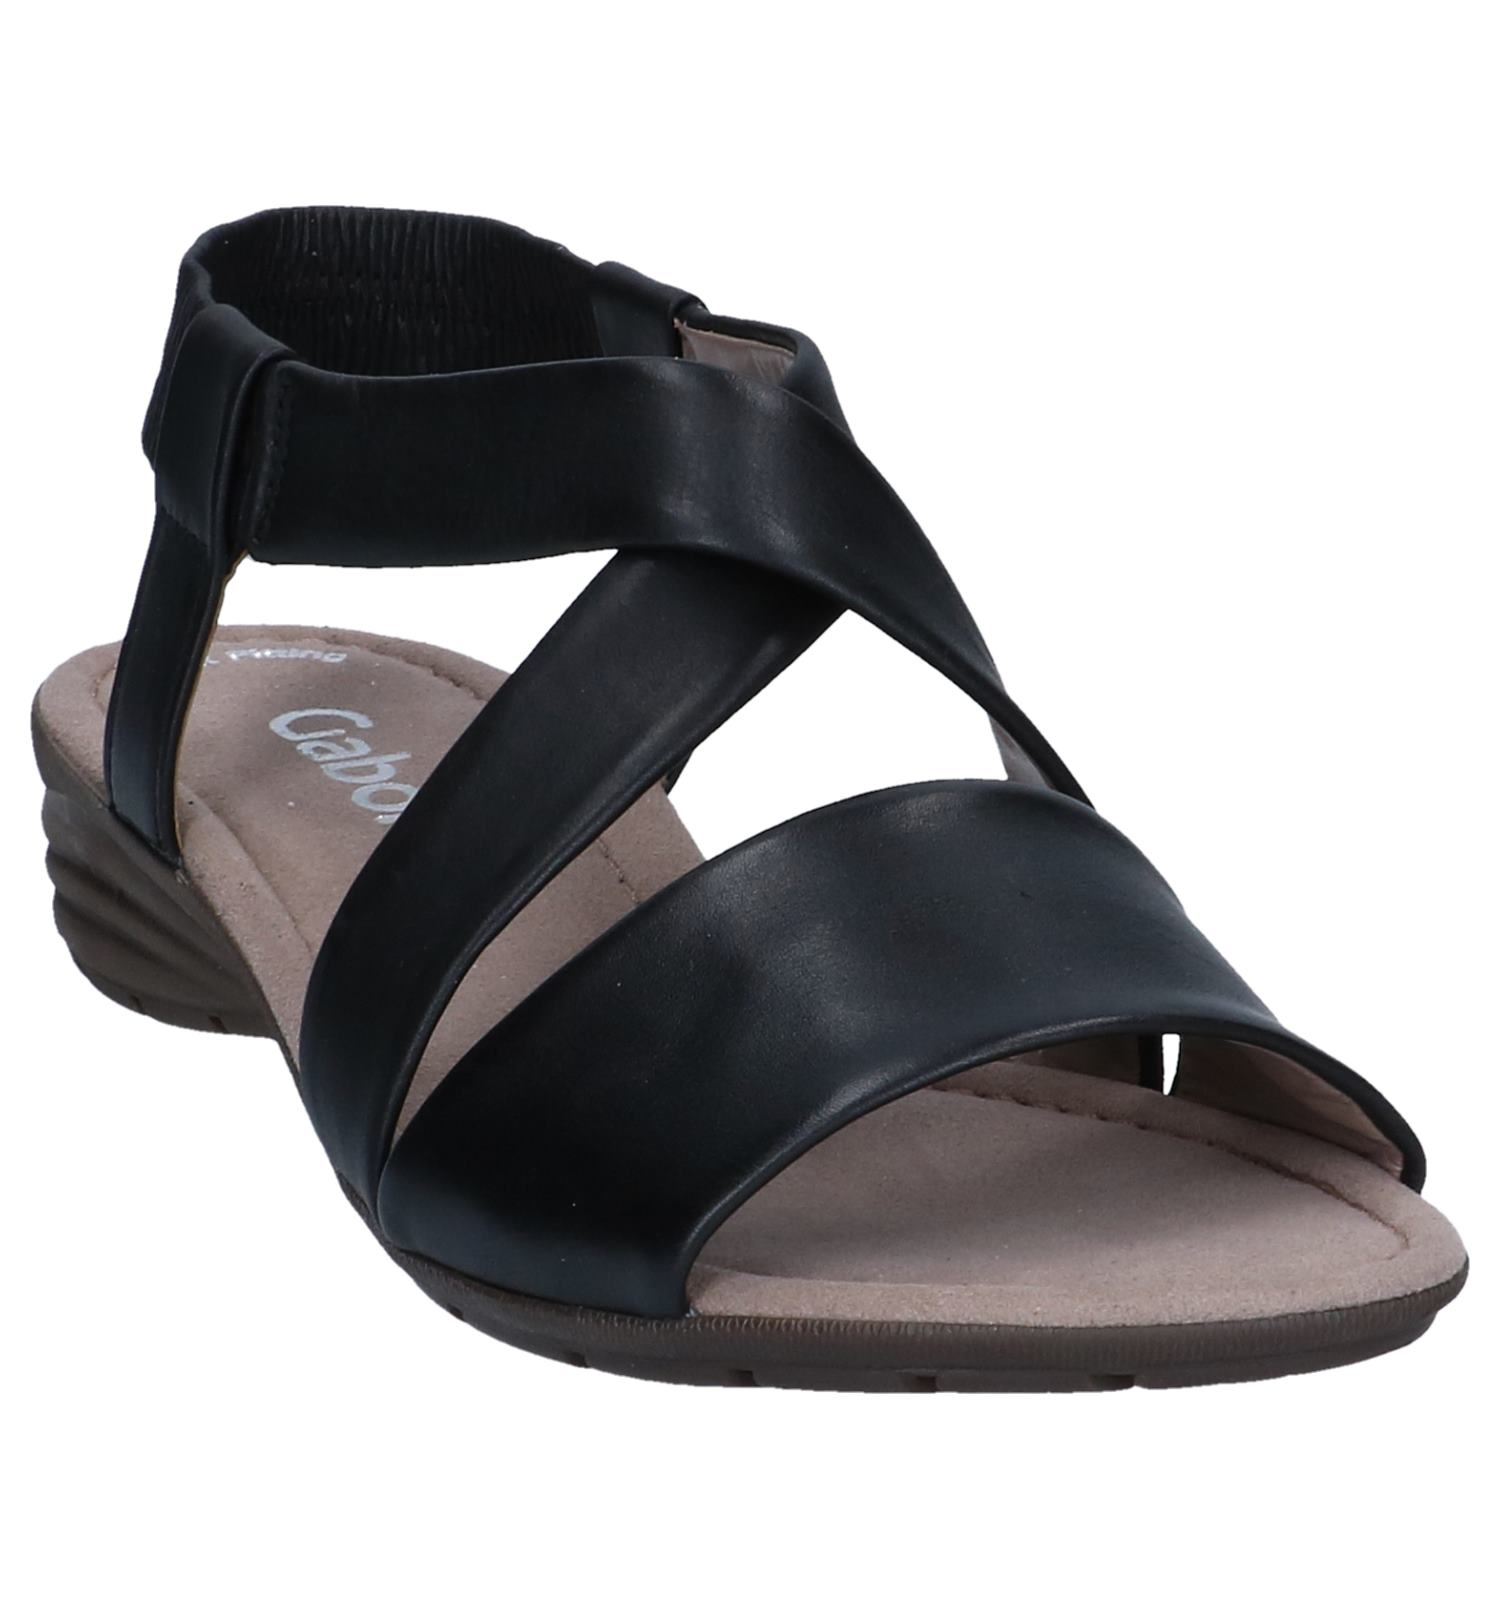 Best Zwarte Gabor Best Sandalen Zwarte Fitting Sandalen Gabor Fitting mOPn0yvN8w